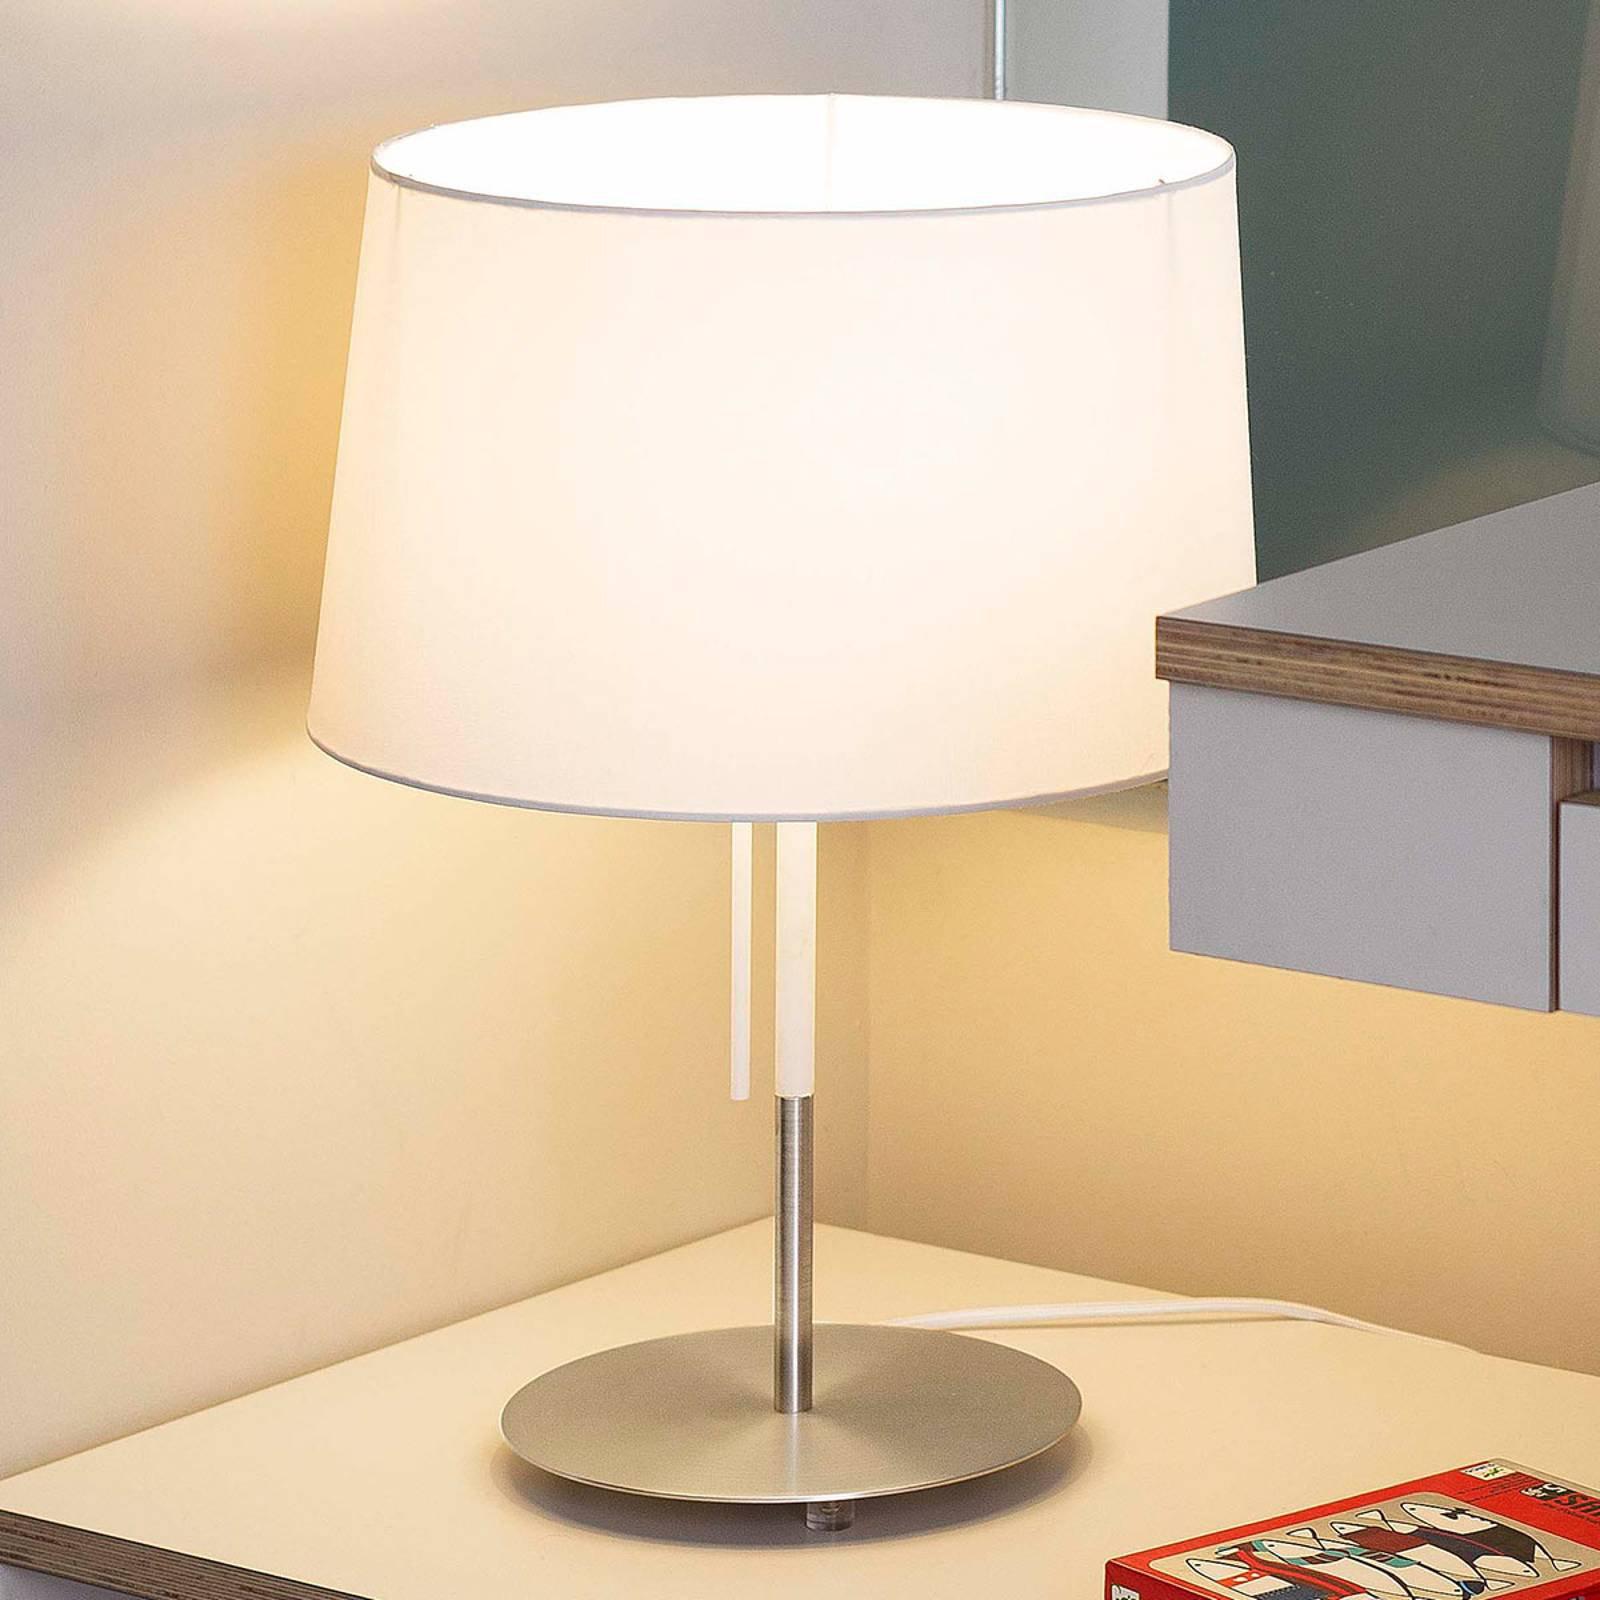 Bordlampe Volta, hvit, tekstil